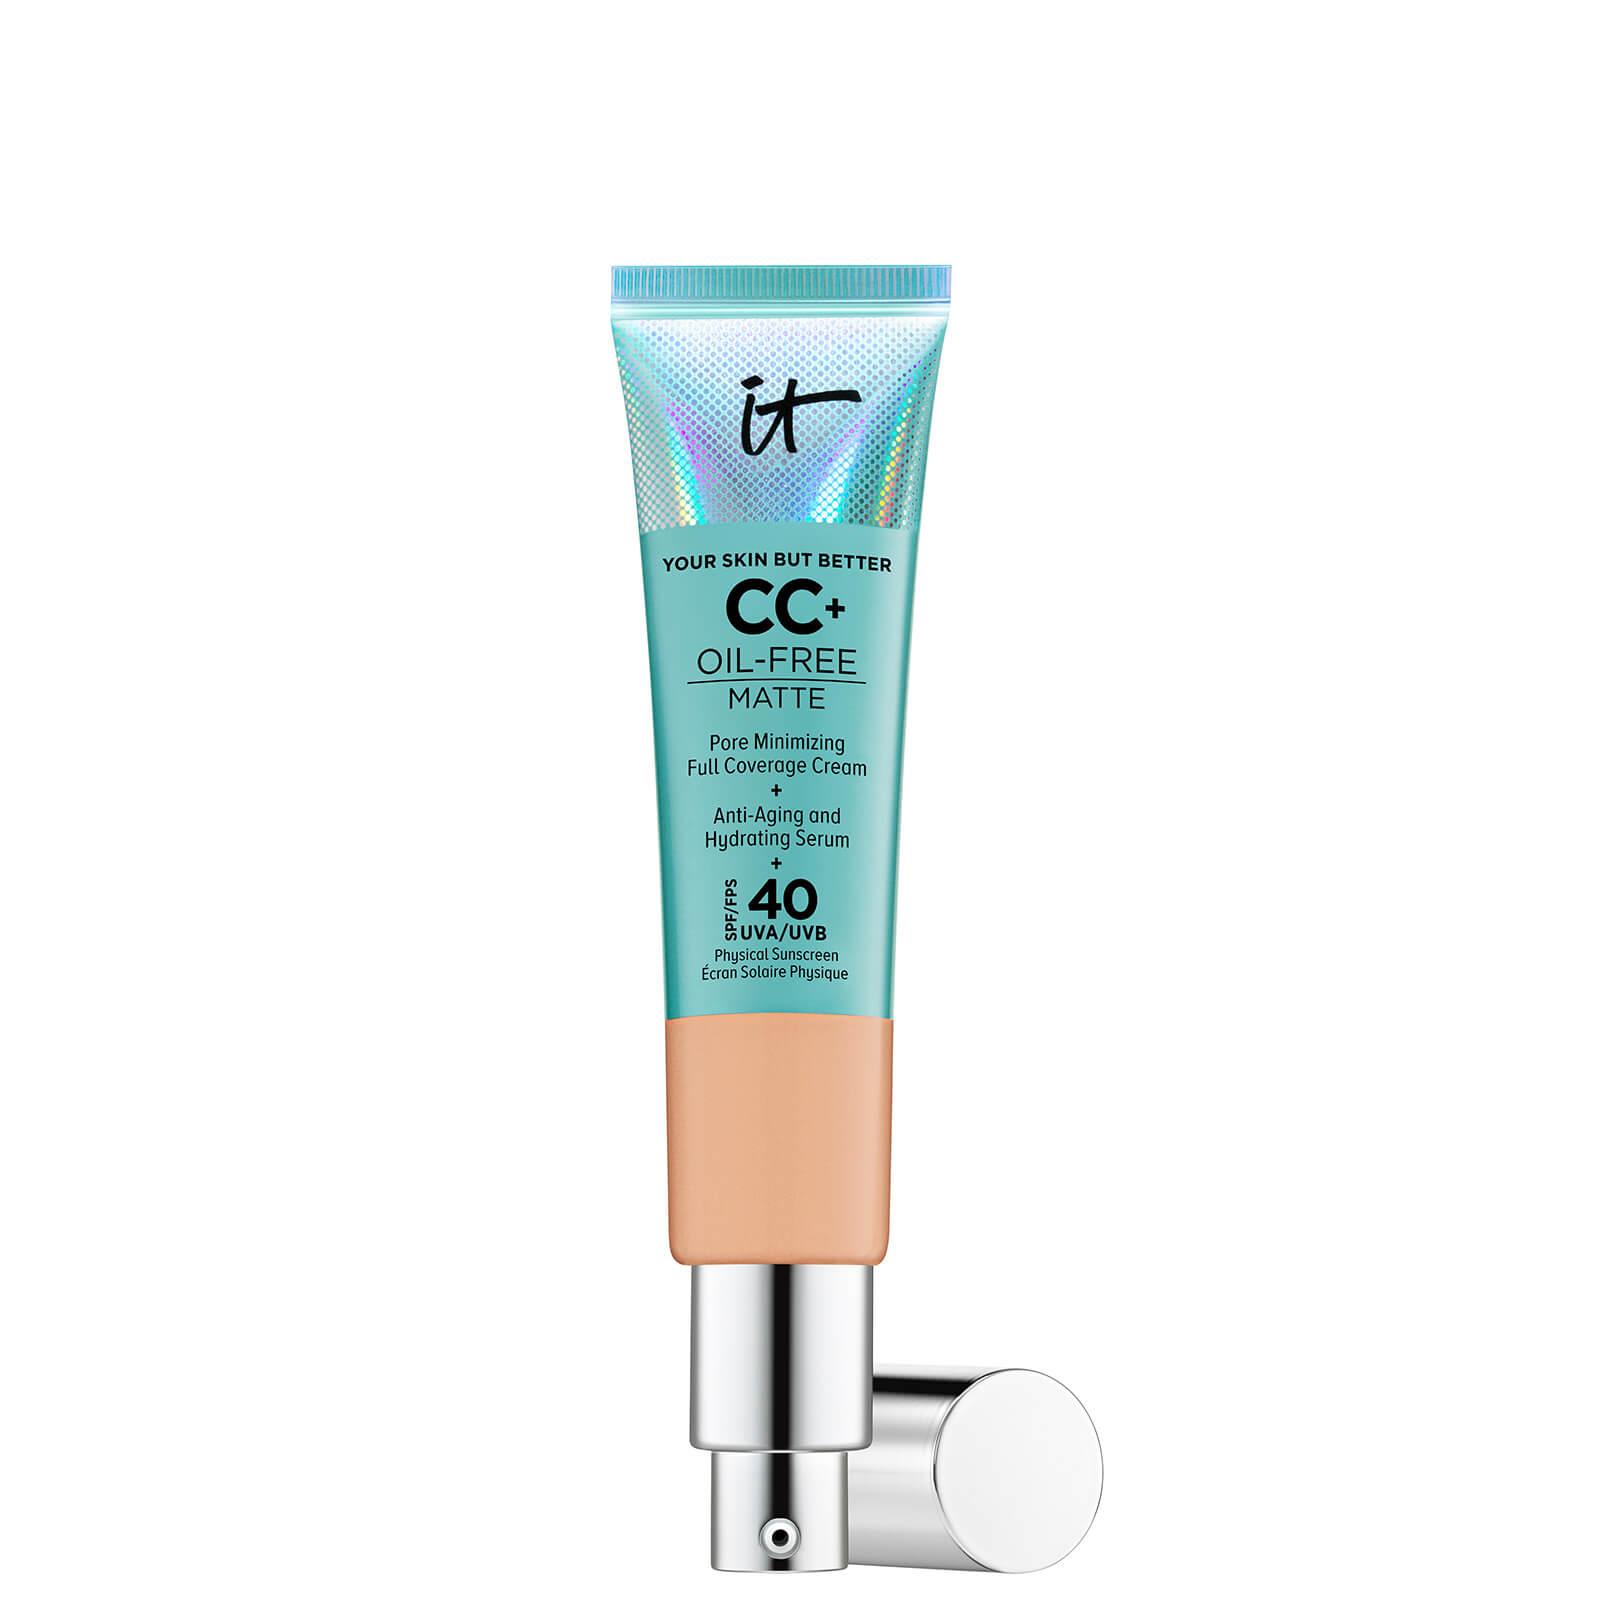 Купить IT Cosmetics Your Skin But Better CC+ Oil-Free Matte SPF40 32ml (Various Shades) - Medium Tan